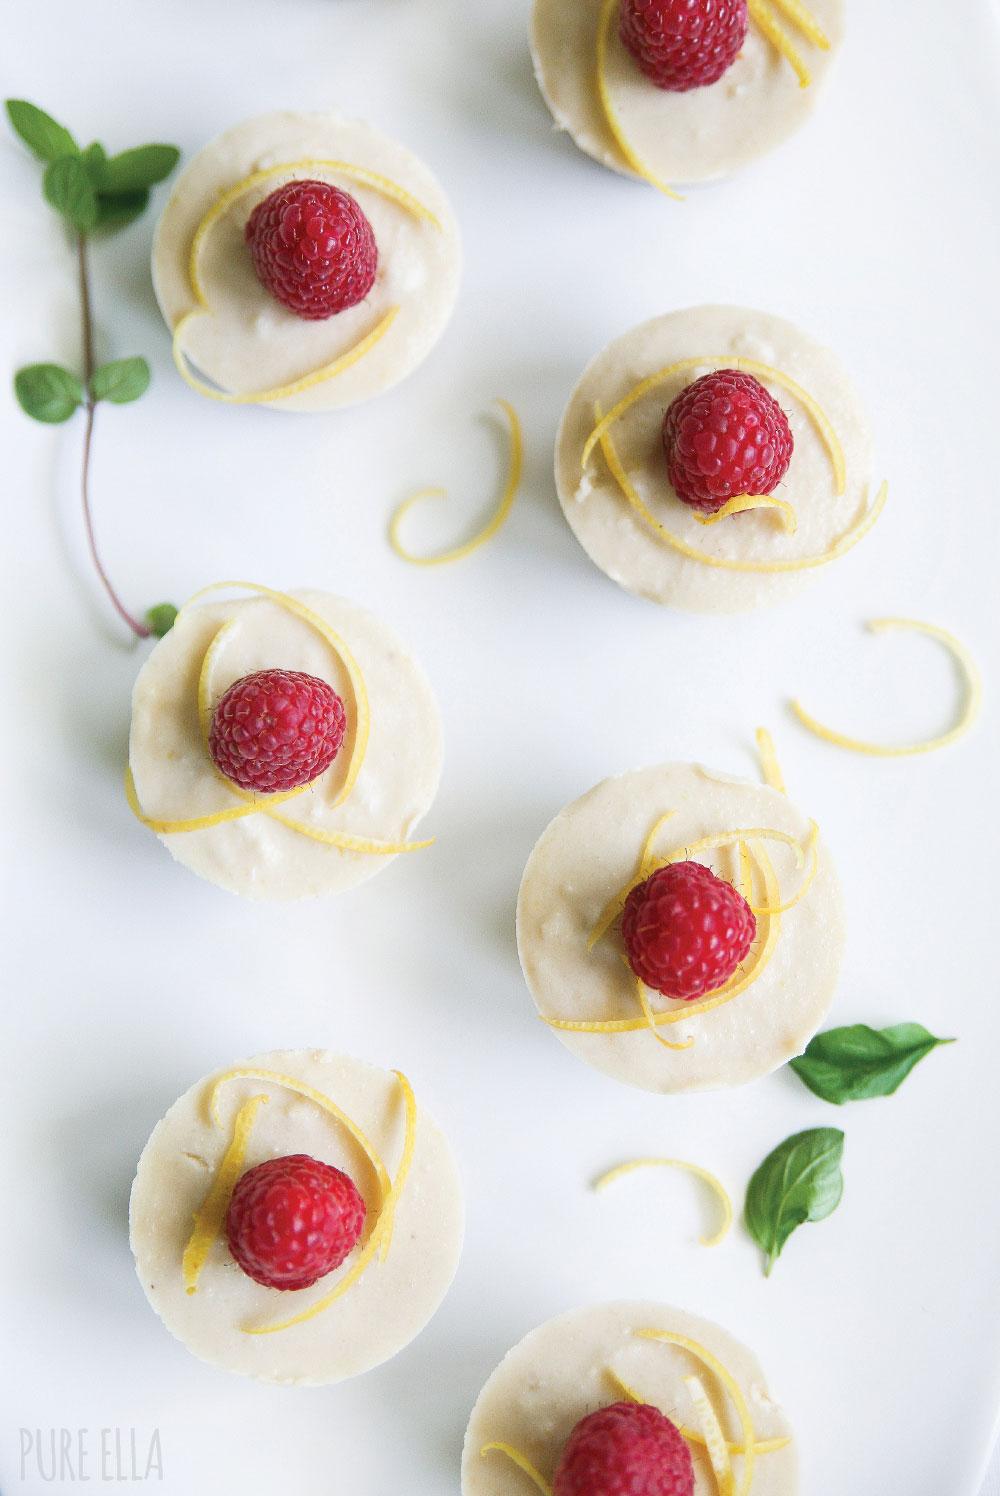 Pure-Ella-raw-raspberry-lemon-raw-vegan-cheesecakes6